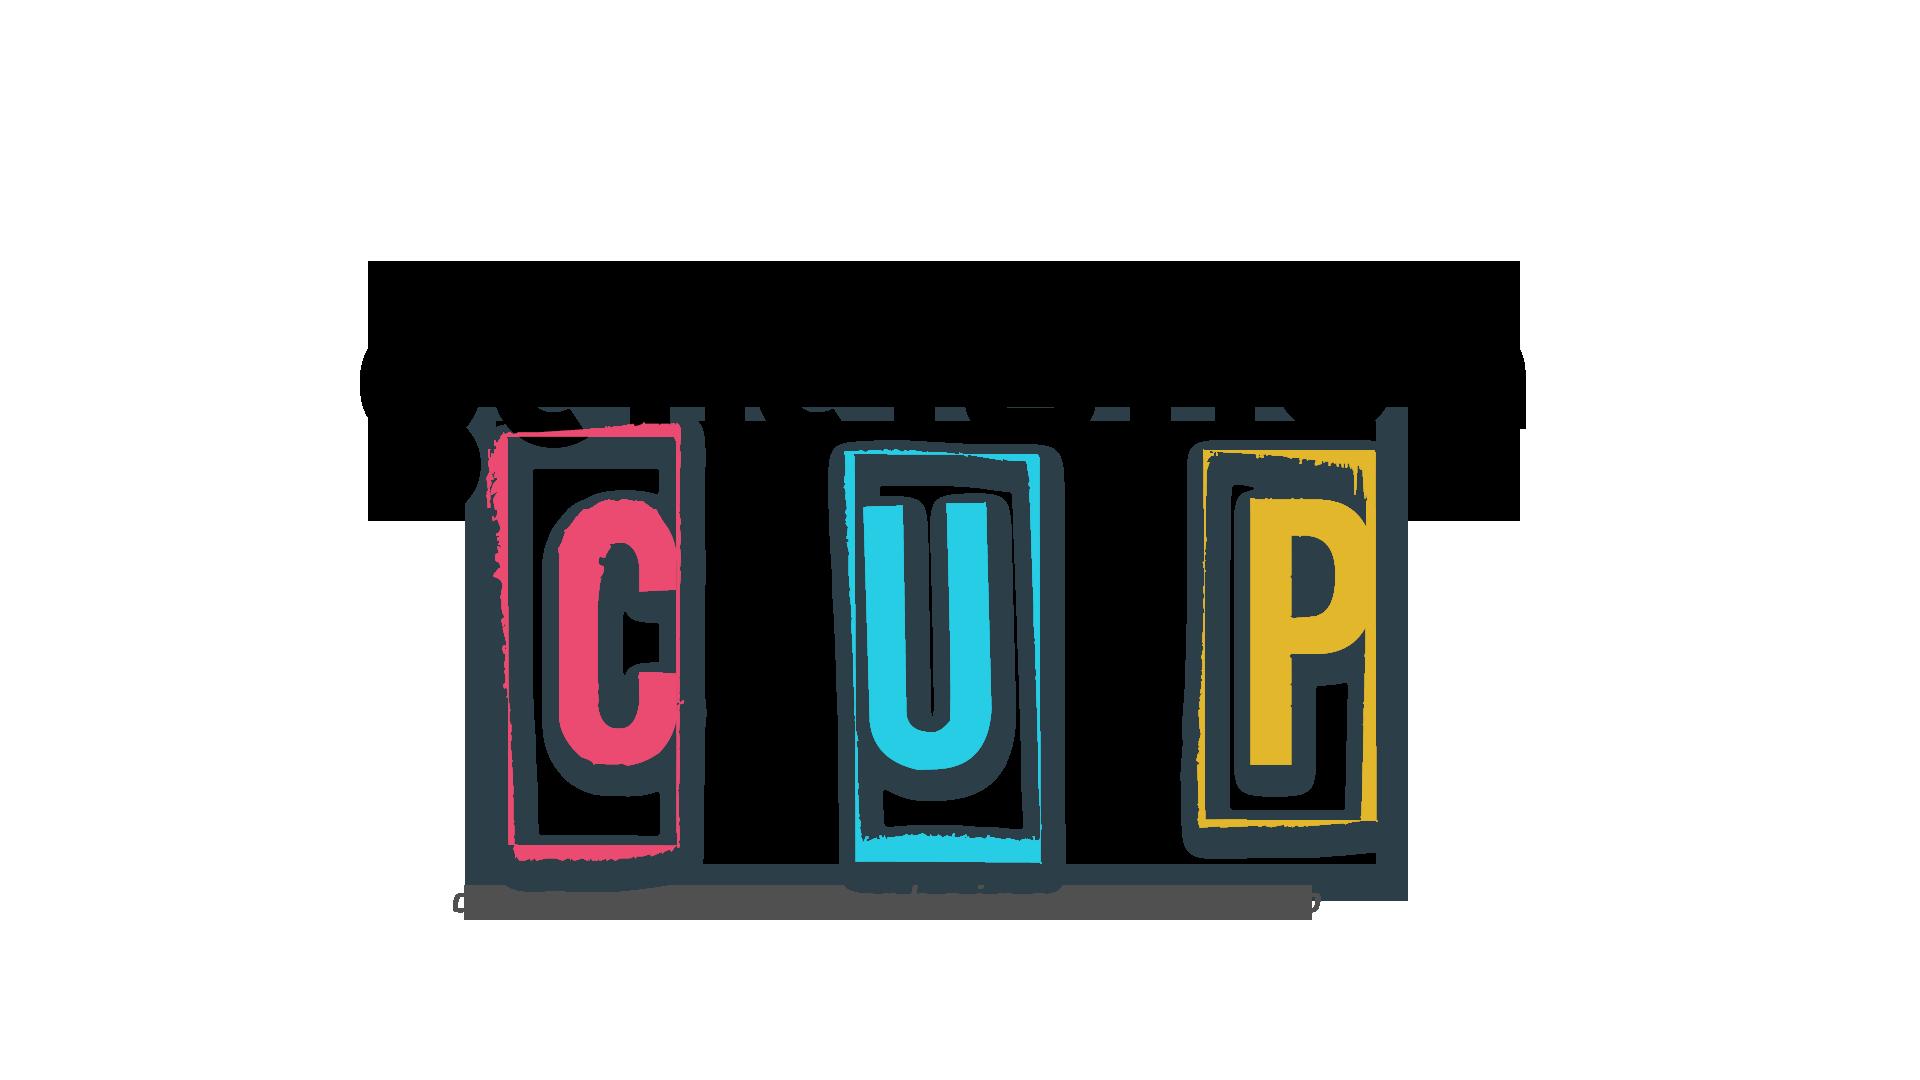 Génération CUP